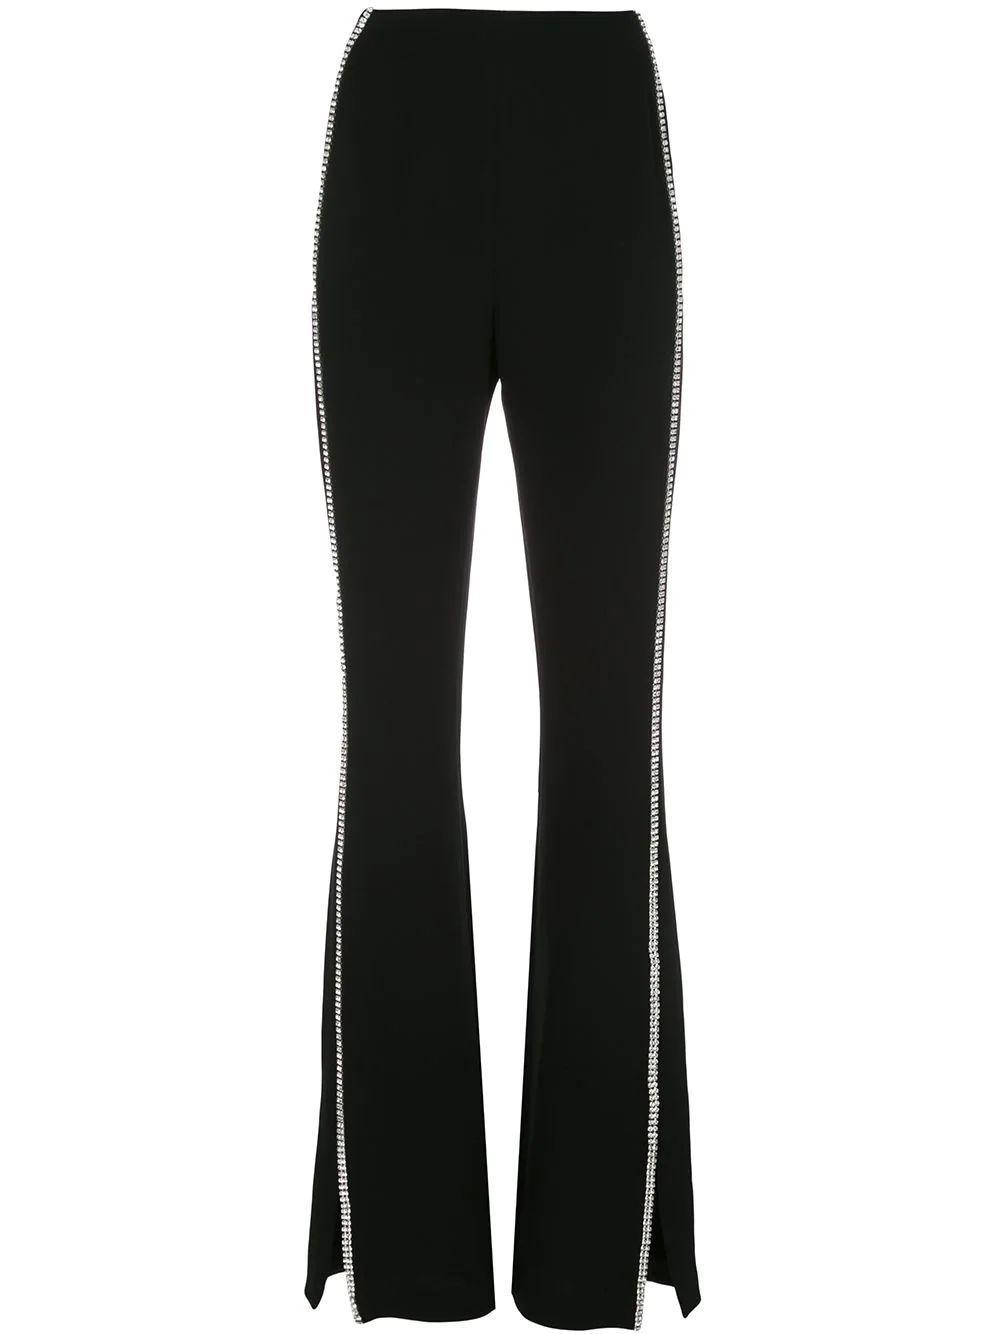 Yumi Rhinestone Suit Pant